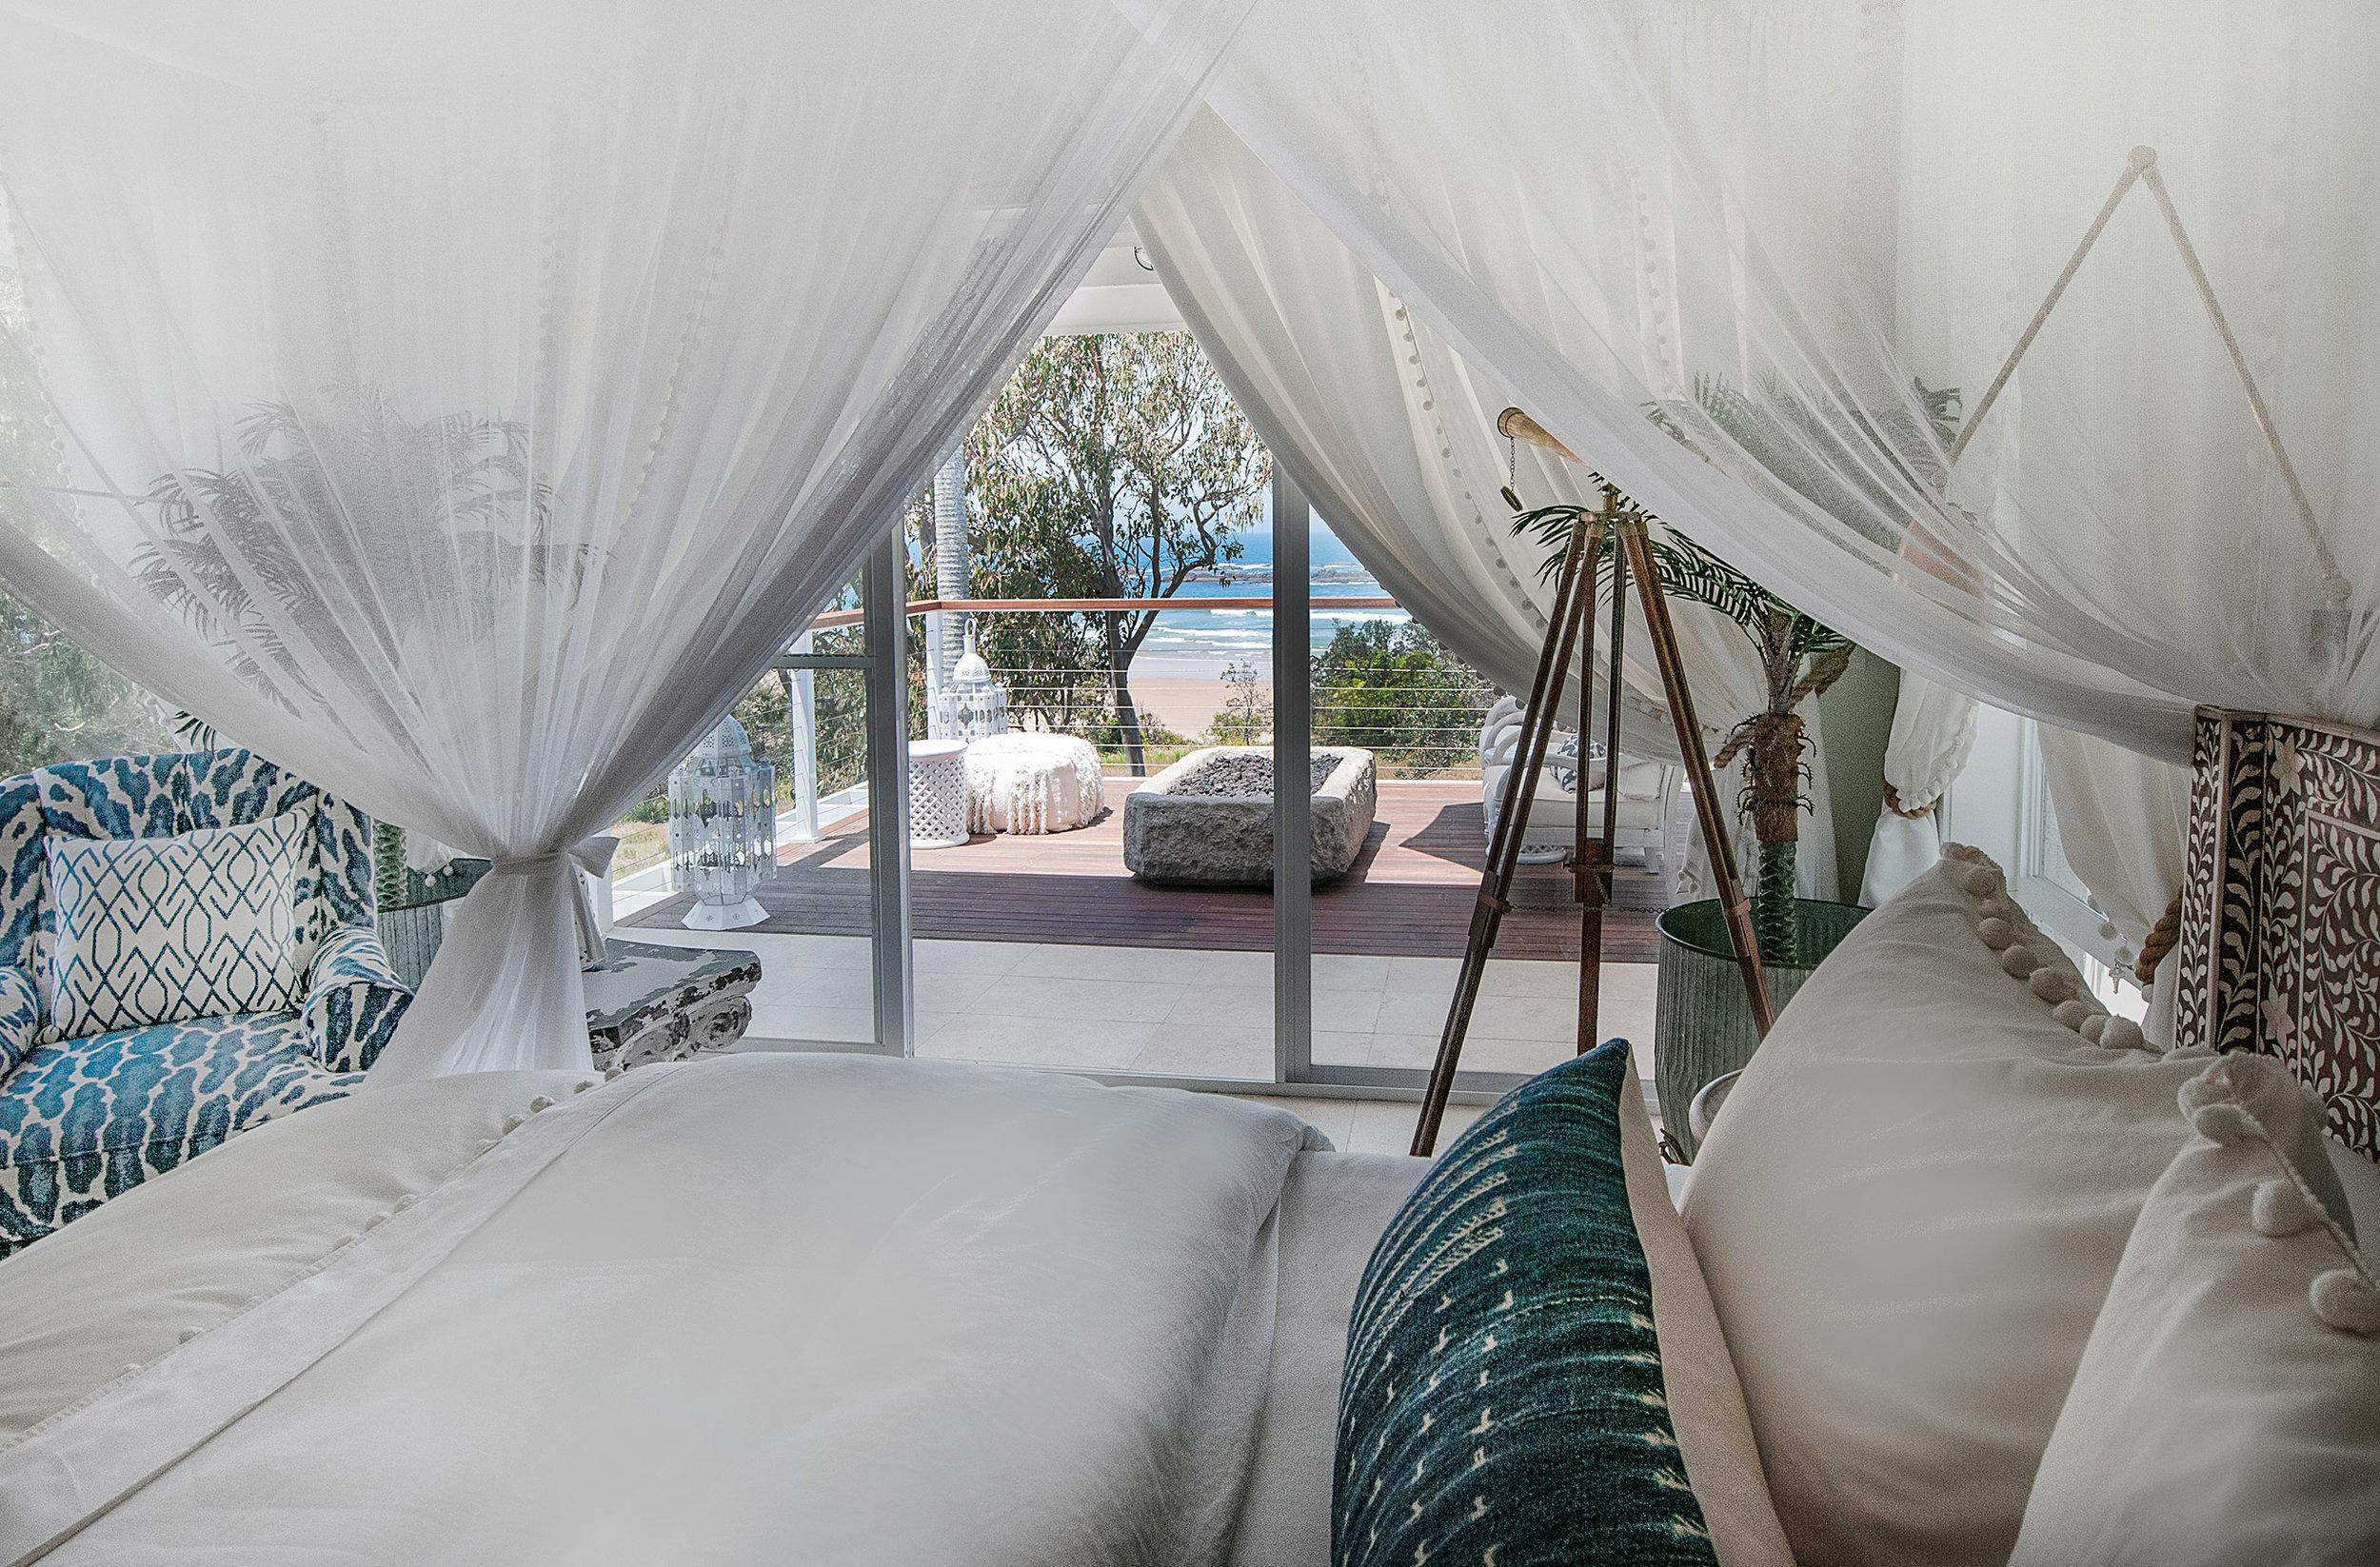 Barellen-7-Bedroom-1a-5-Master-2018-11-05-12.08.00.jpg